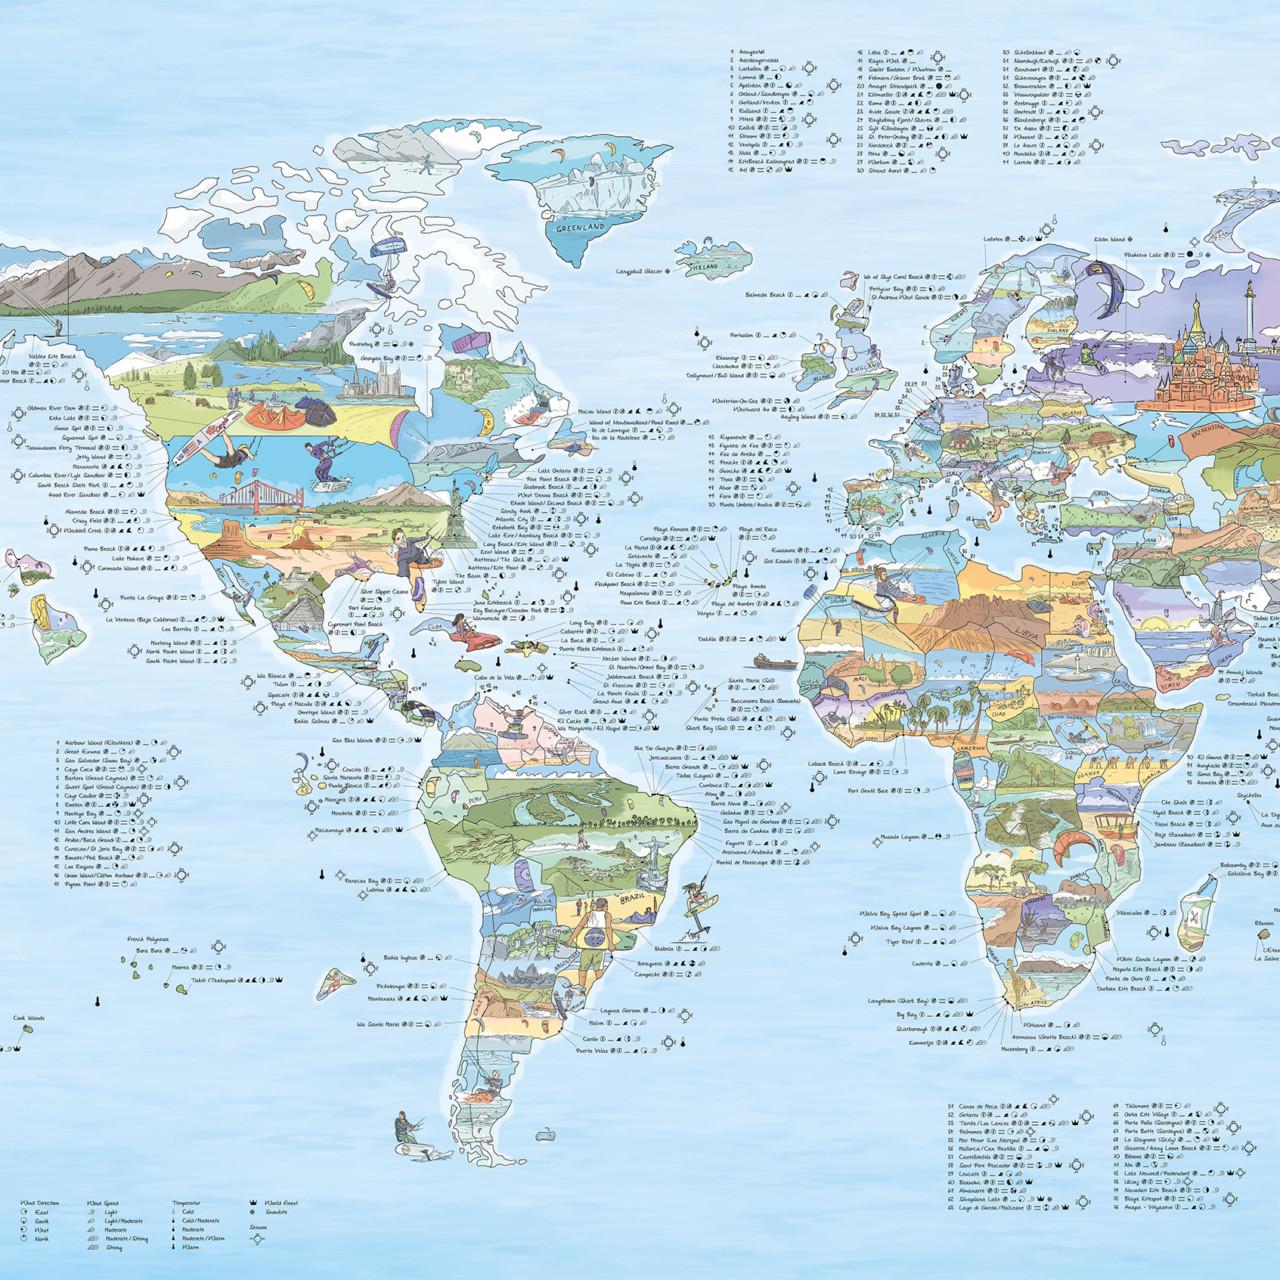 Kitespots Map: wereldkaart voor kitesurfers